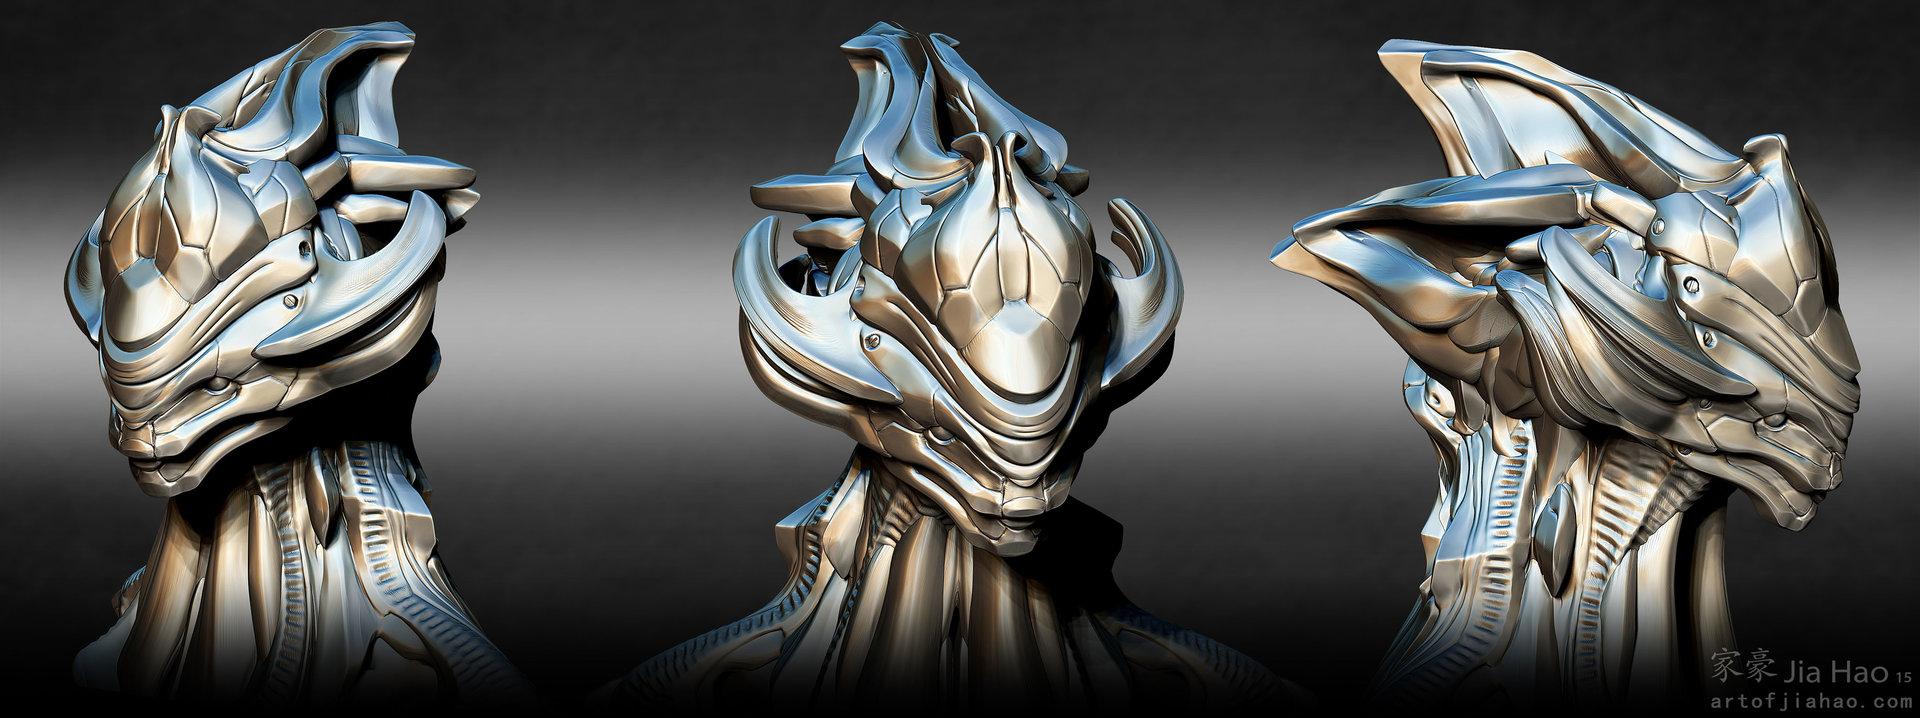 Jia hao 2015 03 alienarmorsuit presentations 01